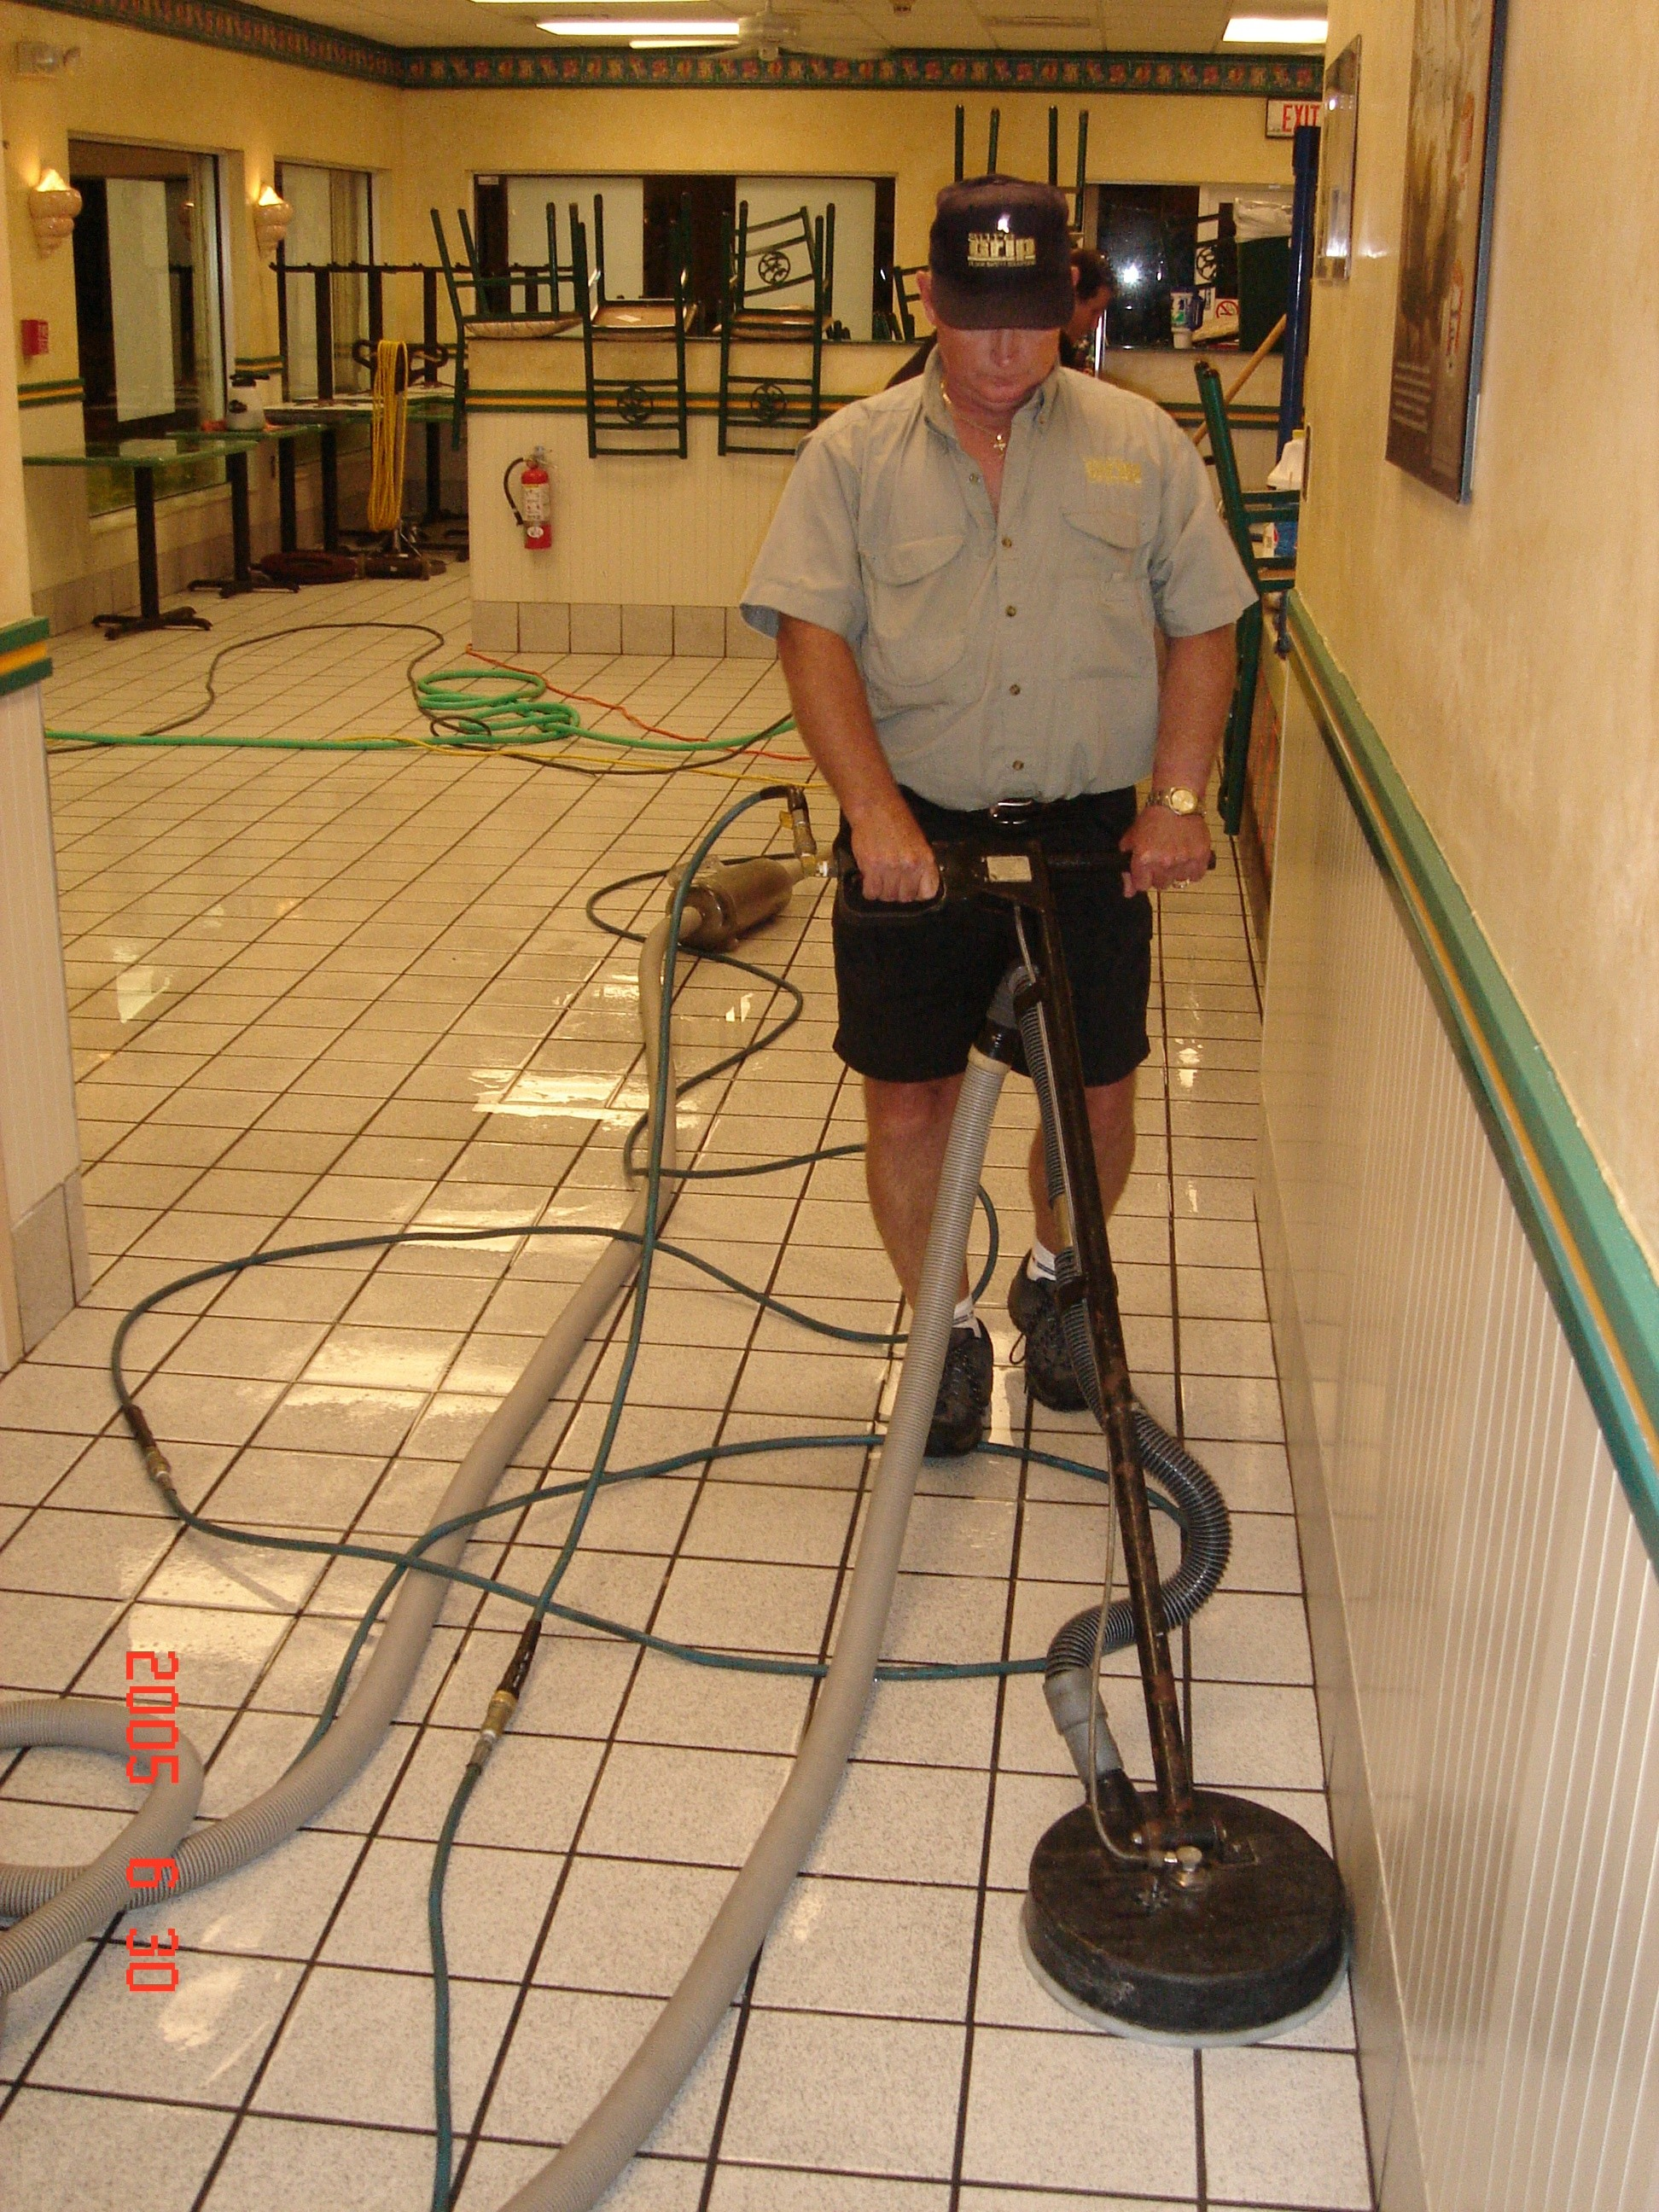 Sure Grip Non Slip Flooring Products And Services Australia Fix - Slippery floor tiles fix